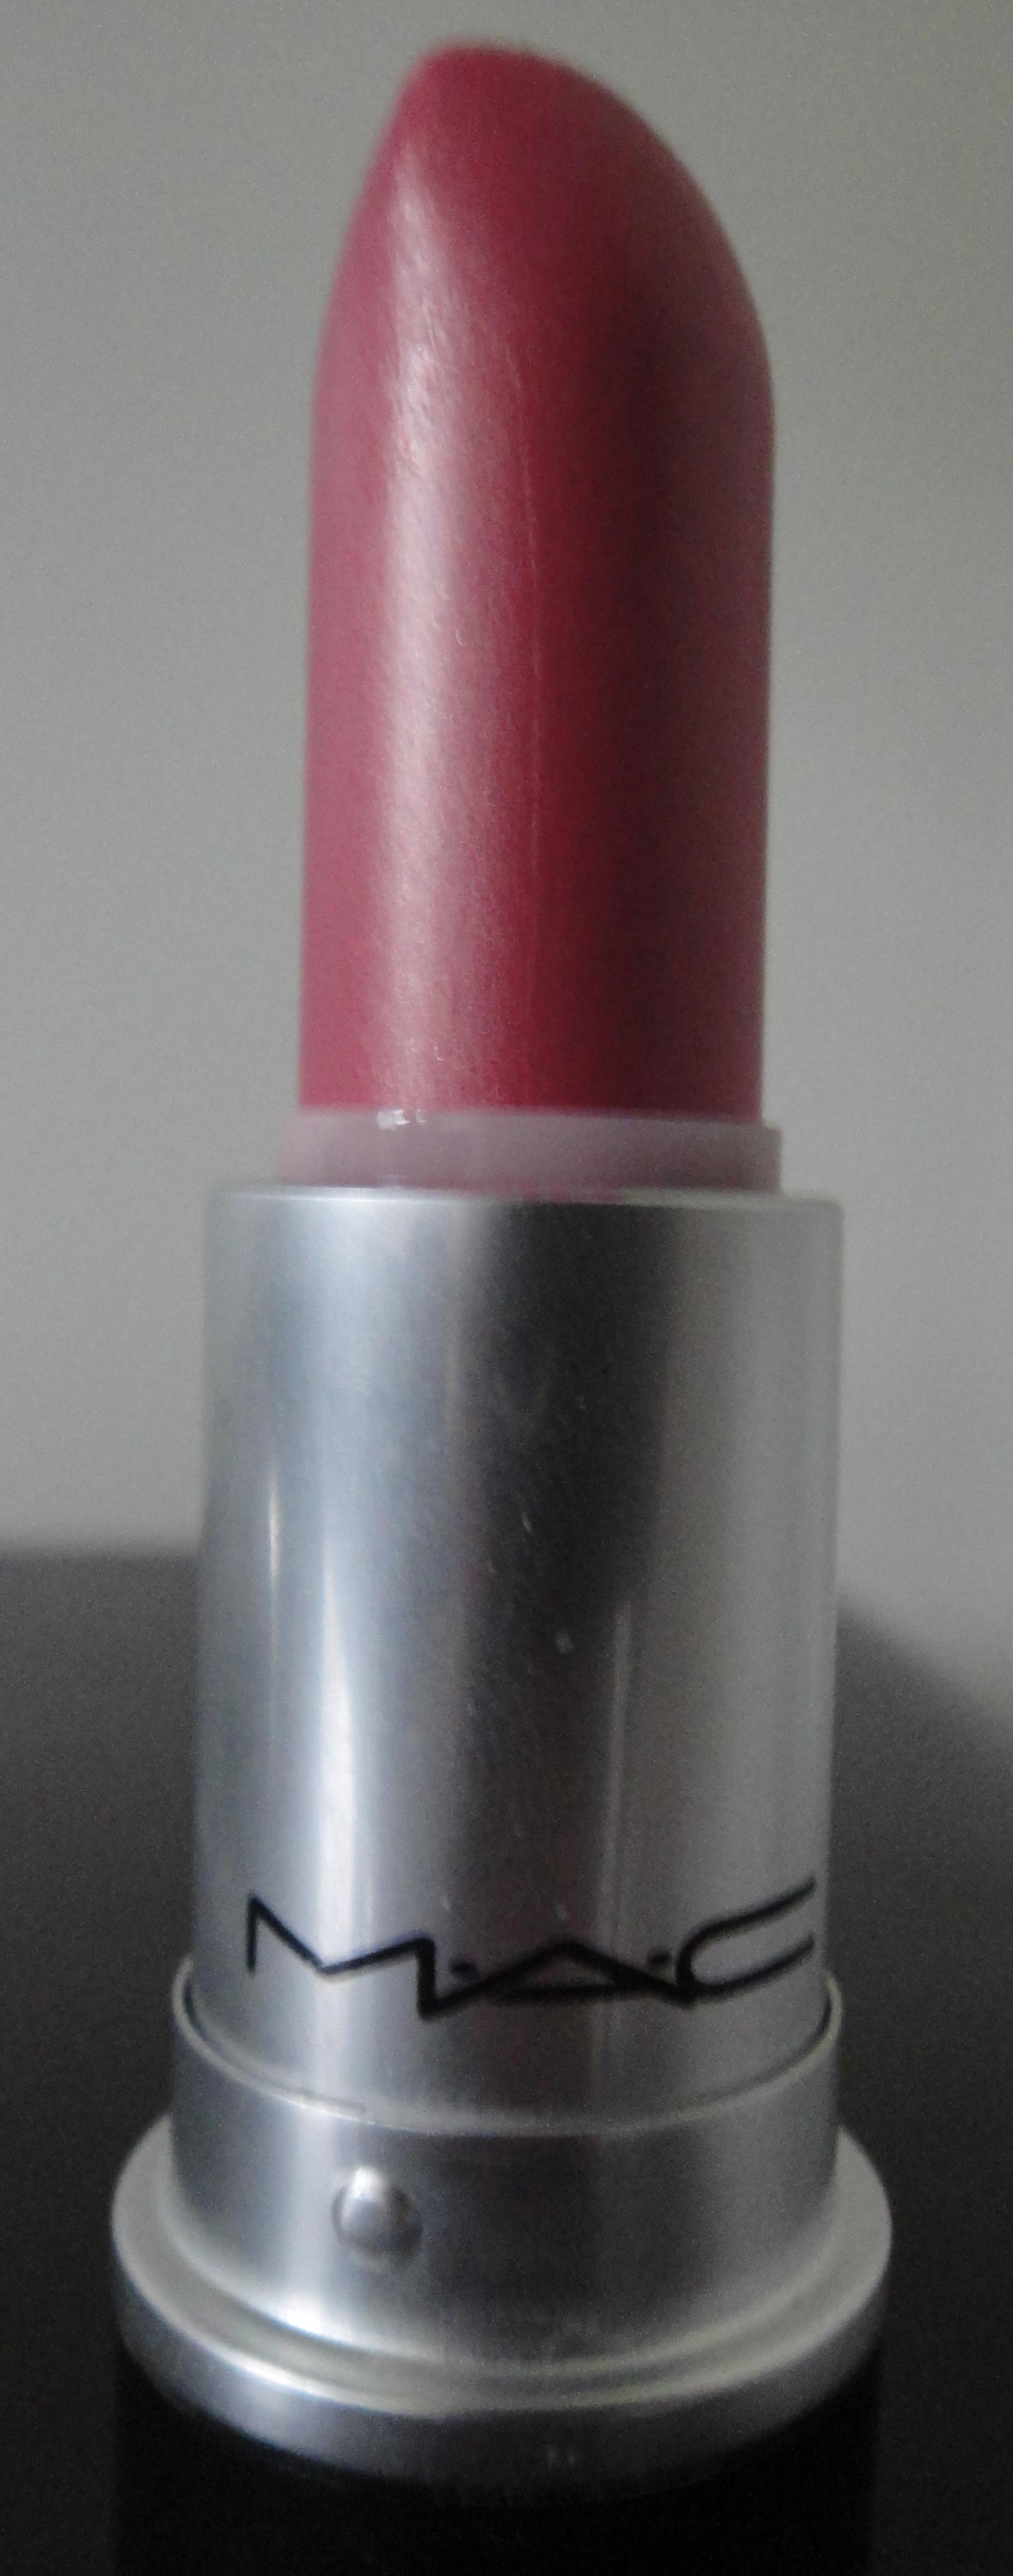 Mac Cosmetics Eye Shadow: MAC BOMBSHELL LIPSTICK (FROST) REVIEW